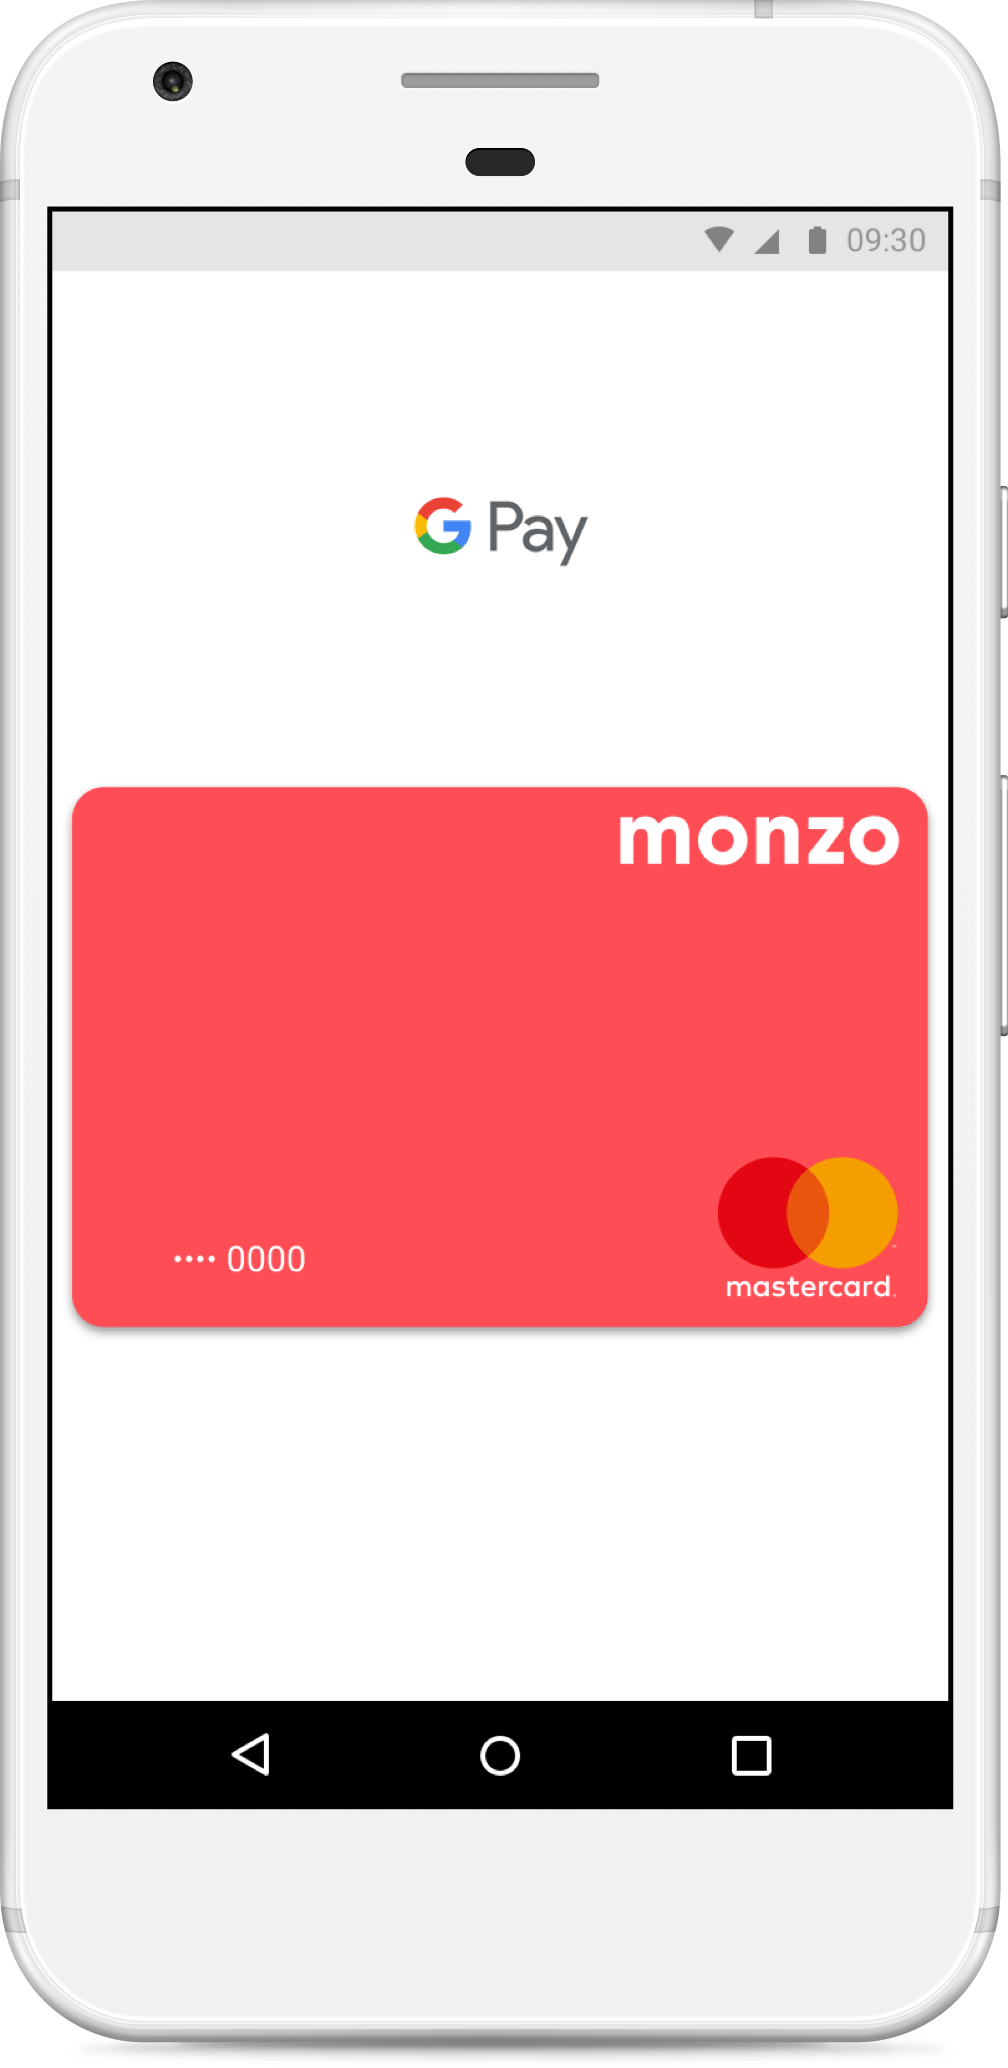 Monzo – Google Pay